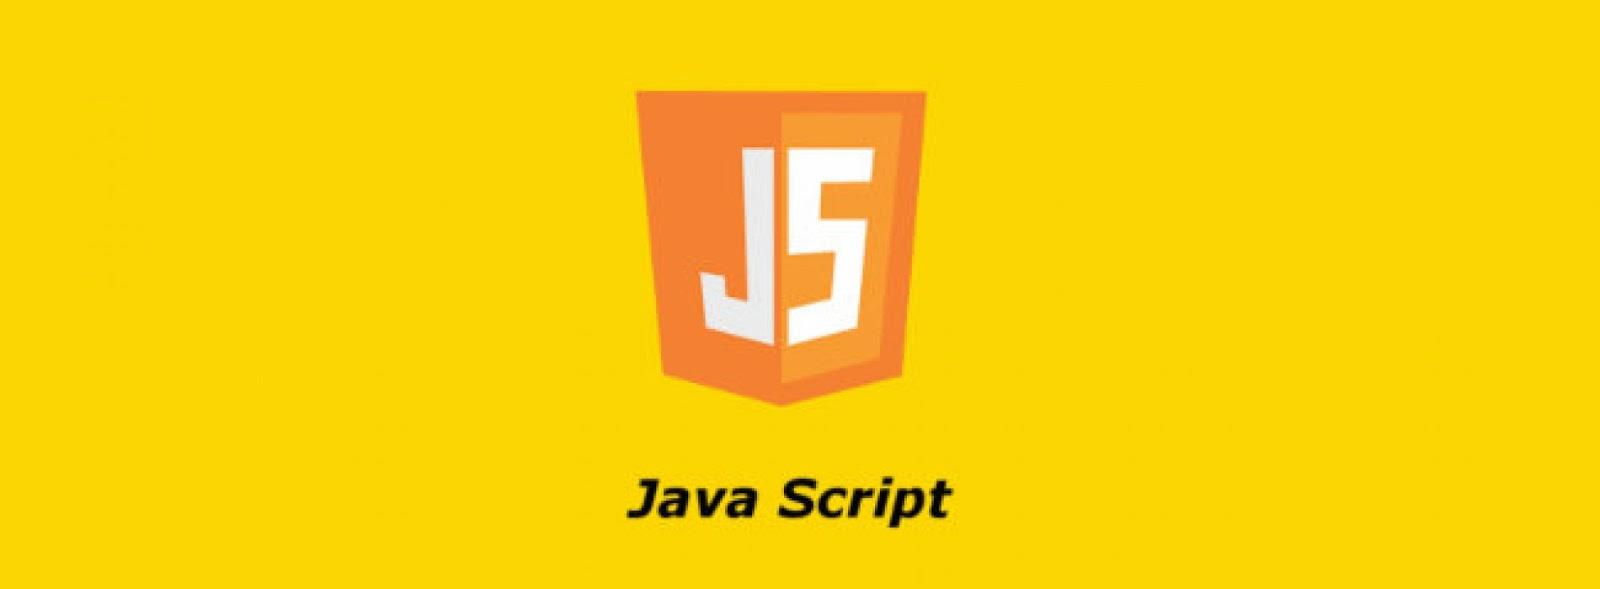 JavaScript Alternatives Method SetInterval and ClearInterval